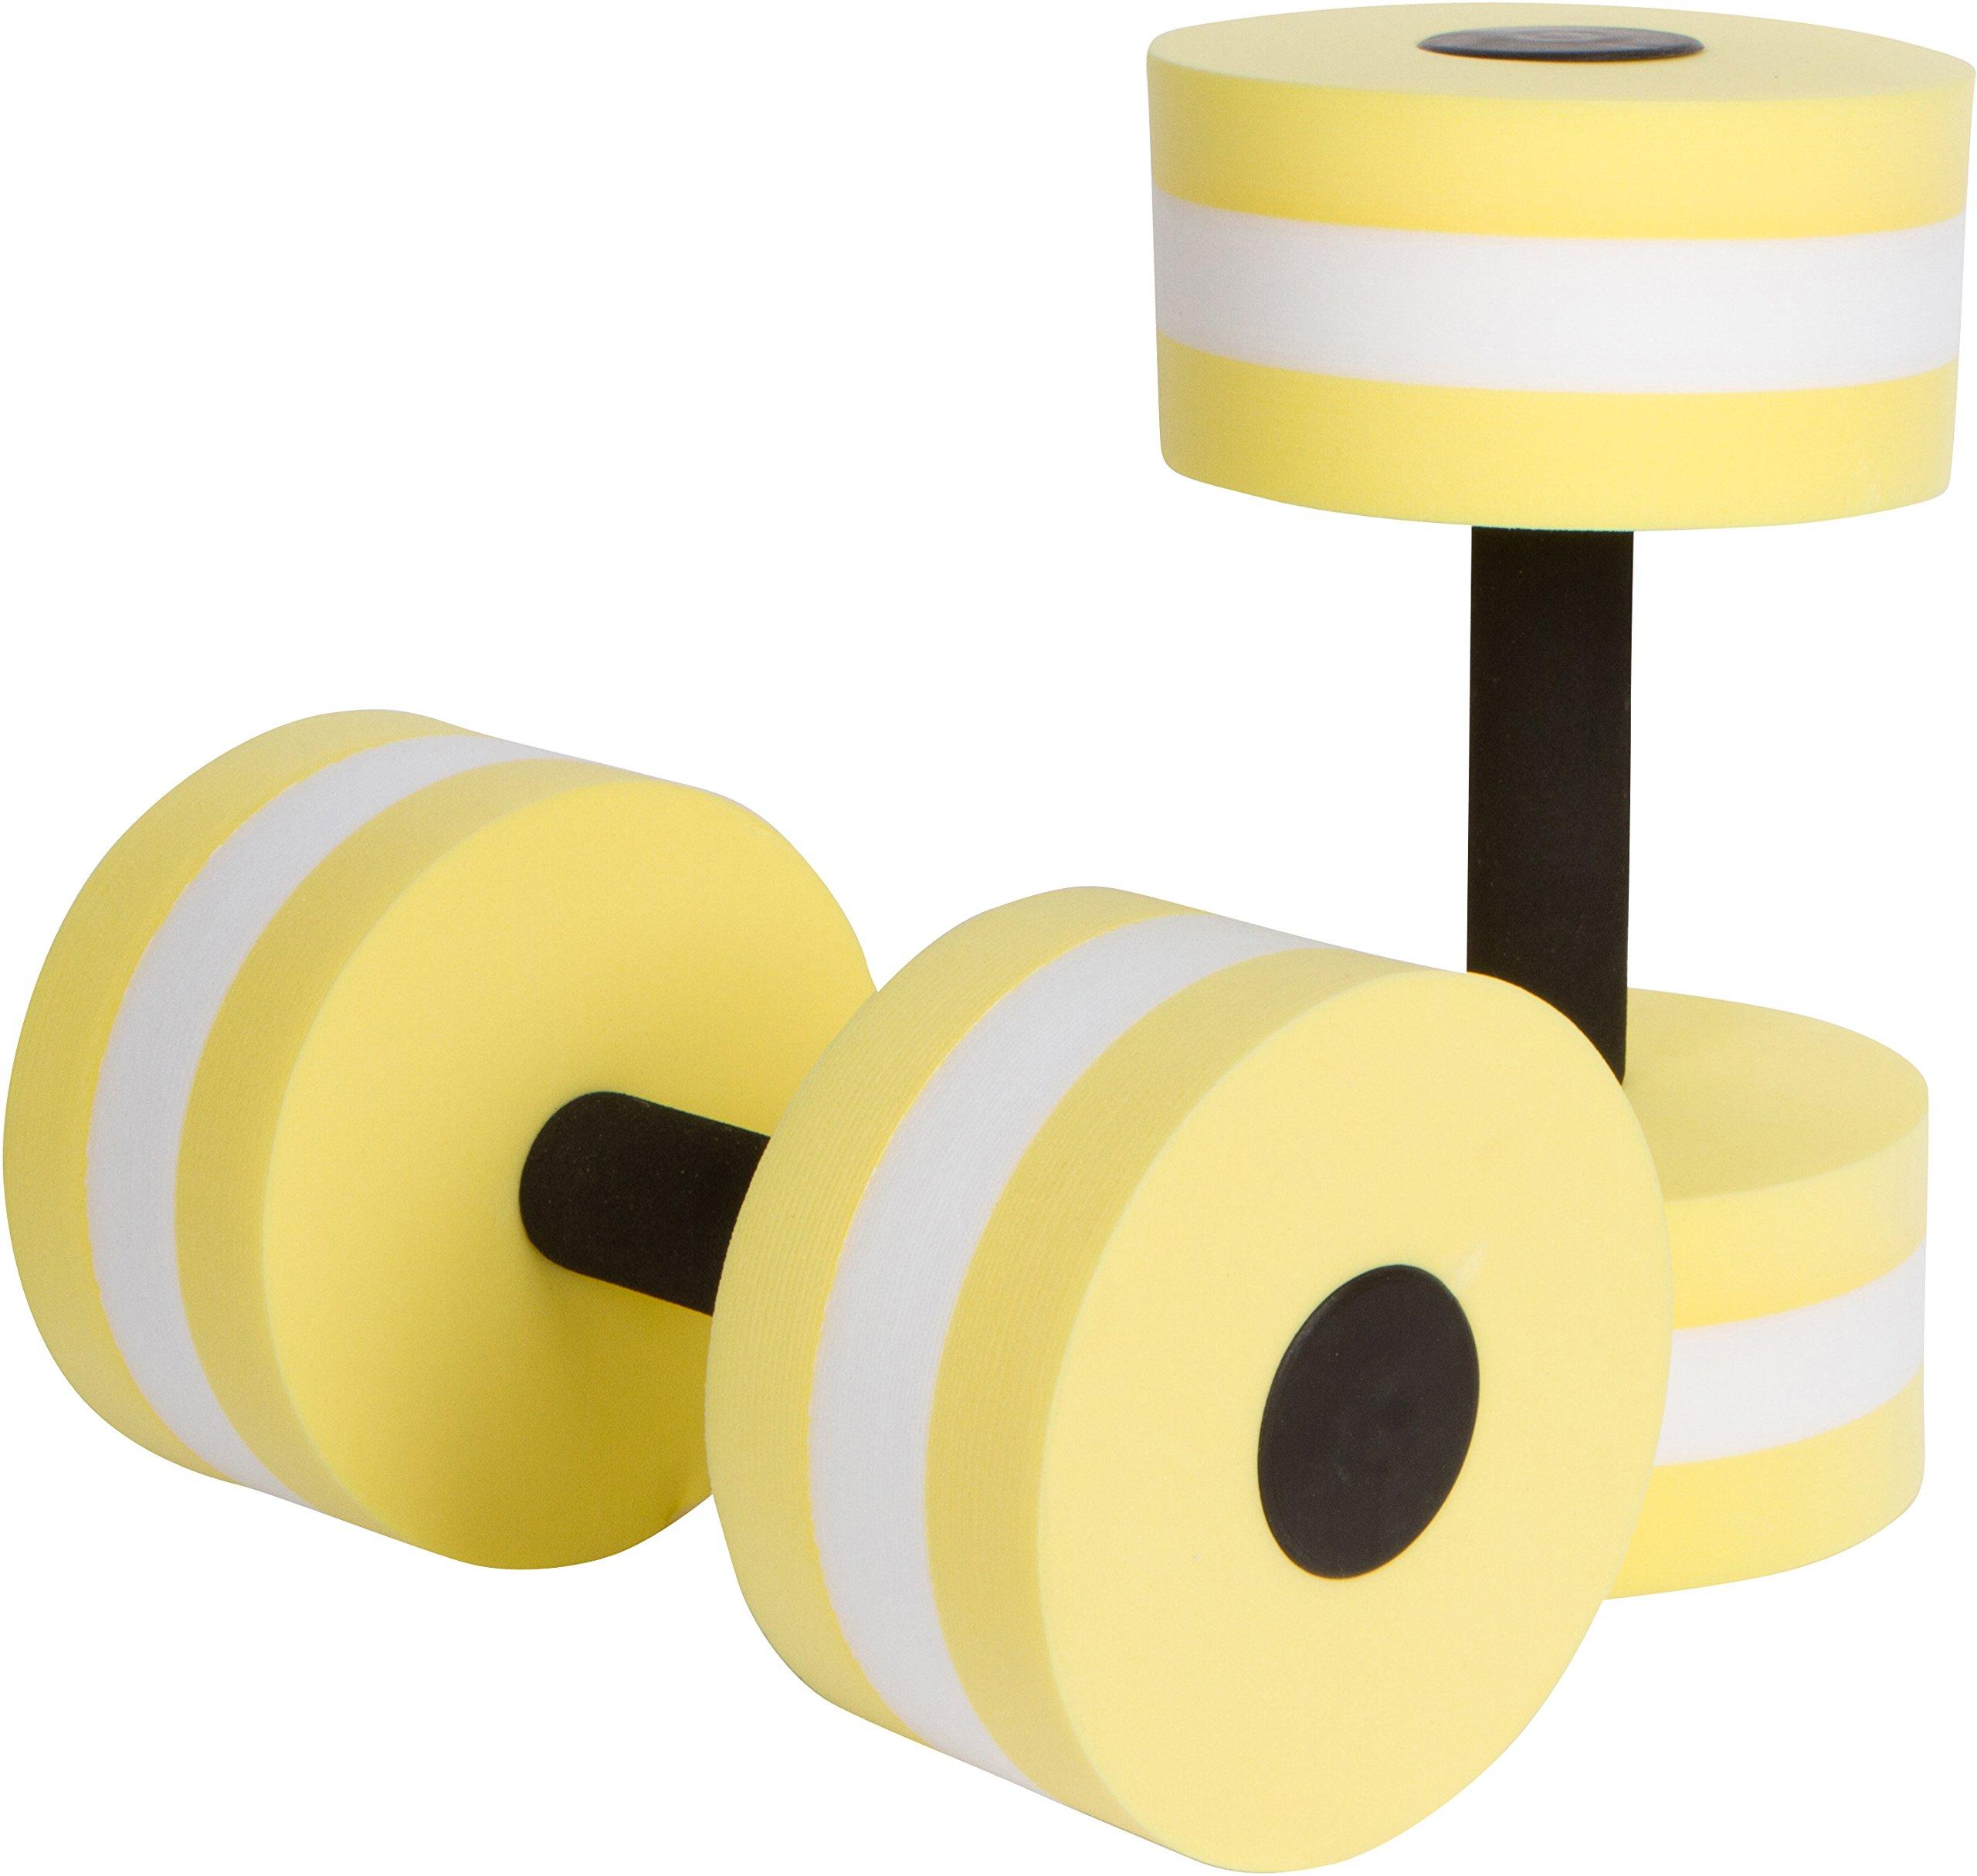 Trademark Innovations Aquatic Exercise Dumbells - Set of 2 Foam - for Water Aerobics (Yellow)